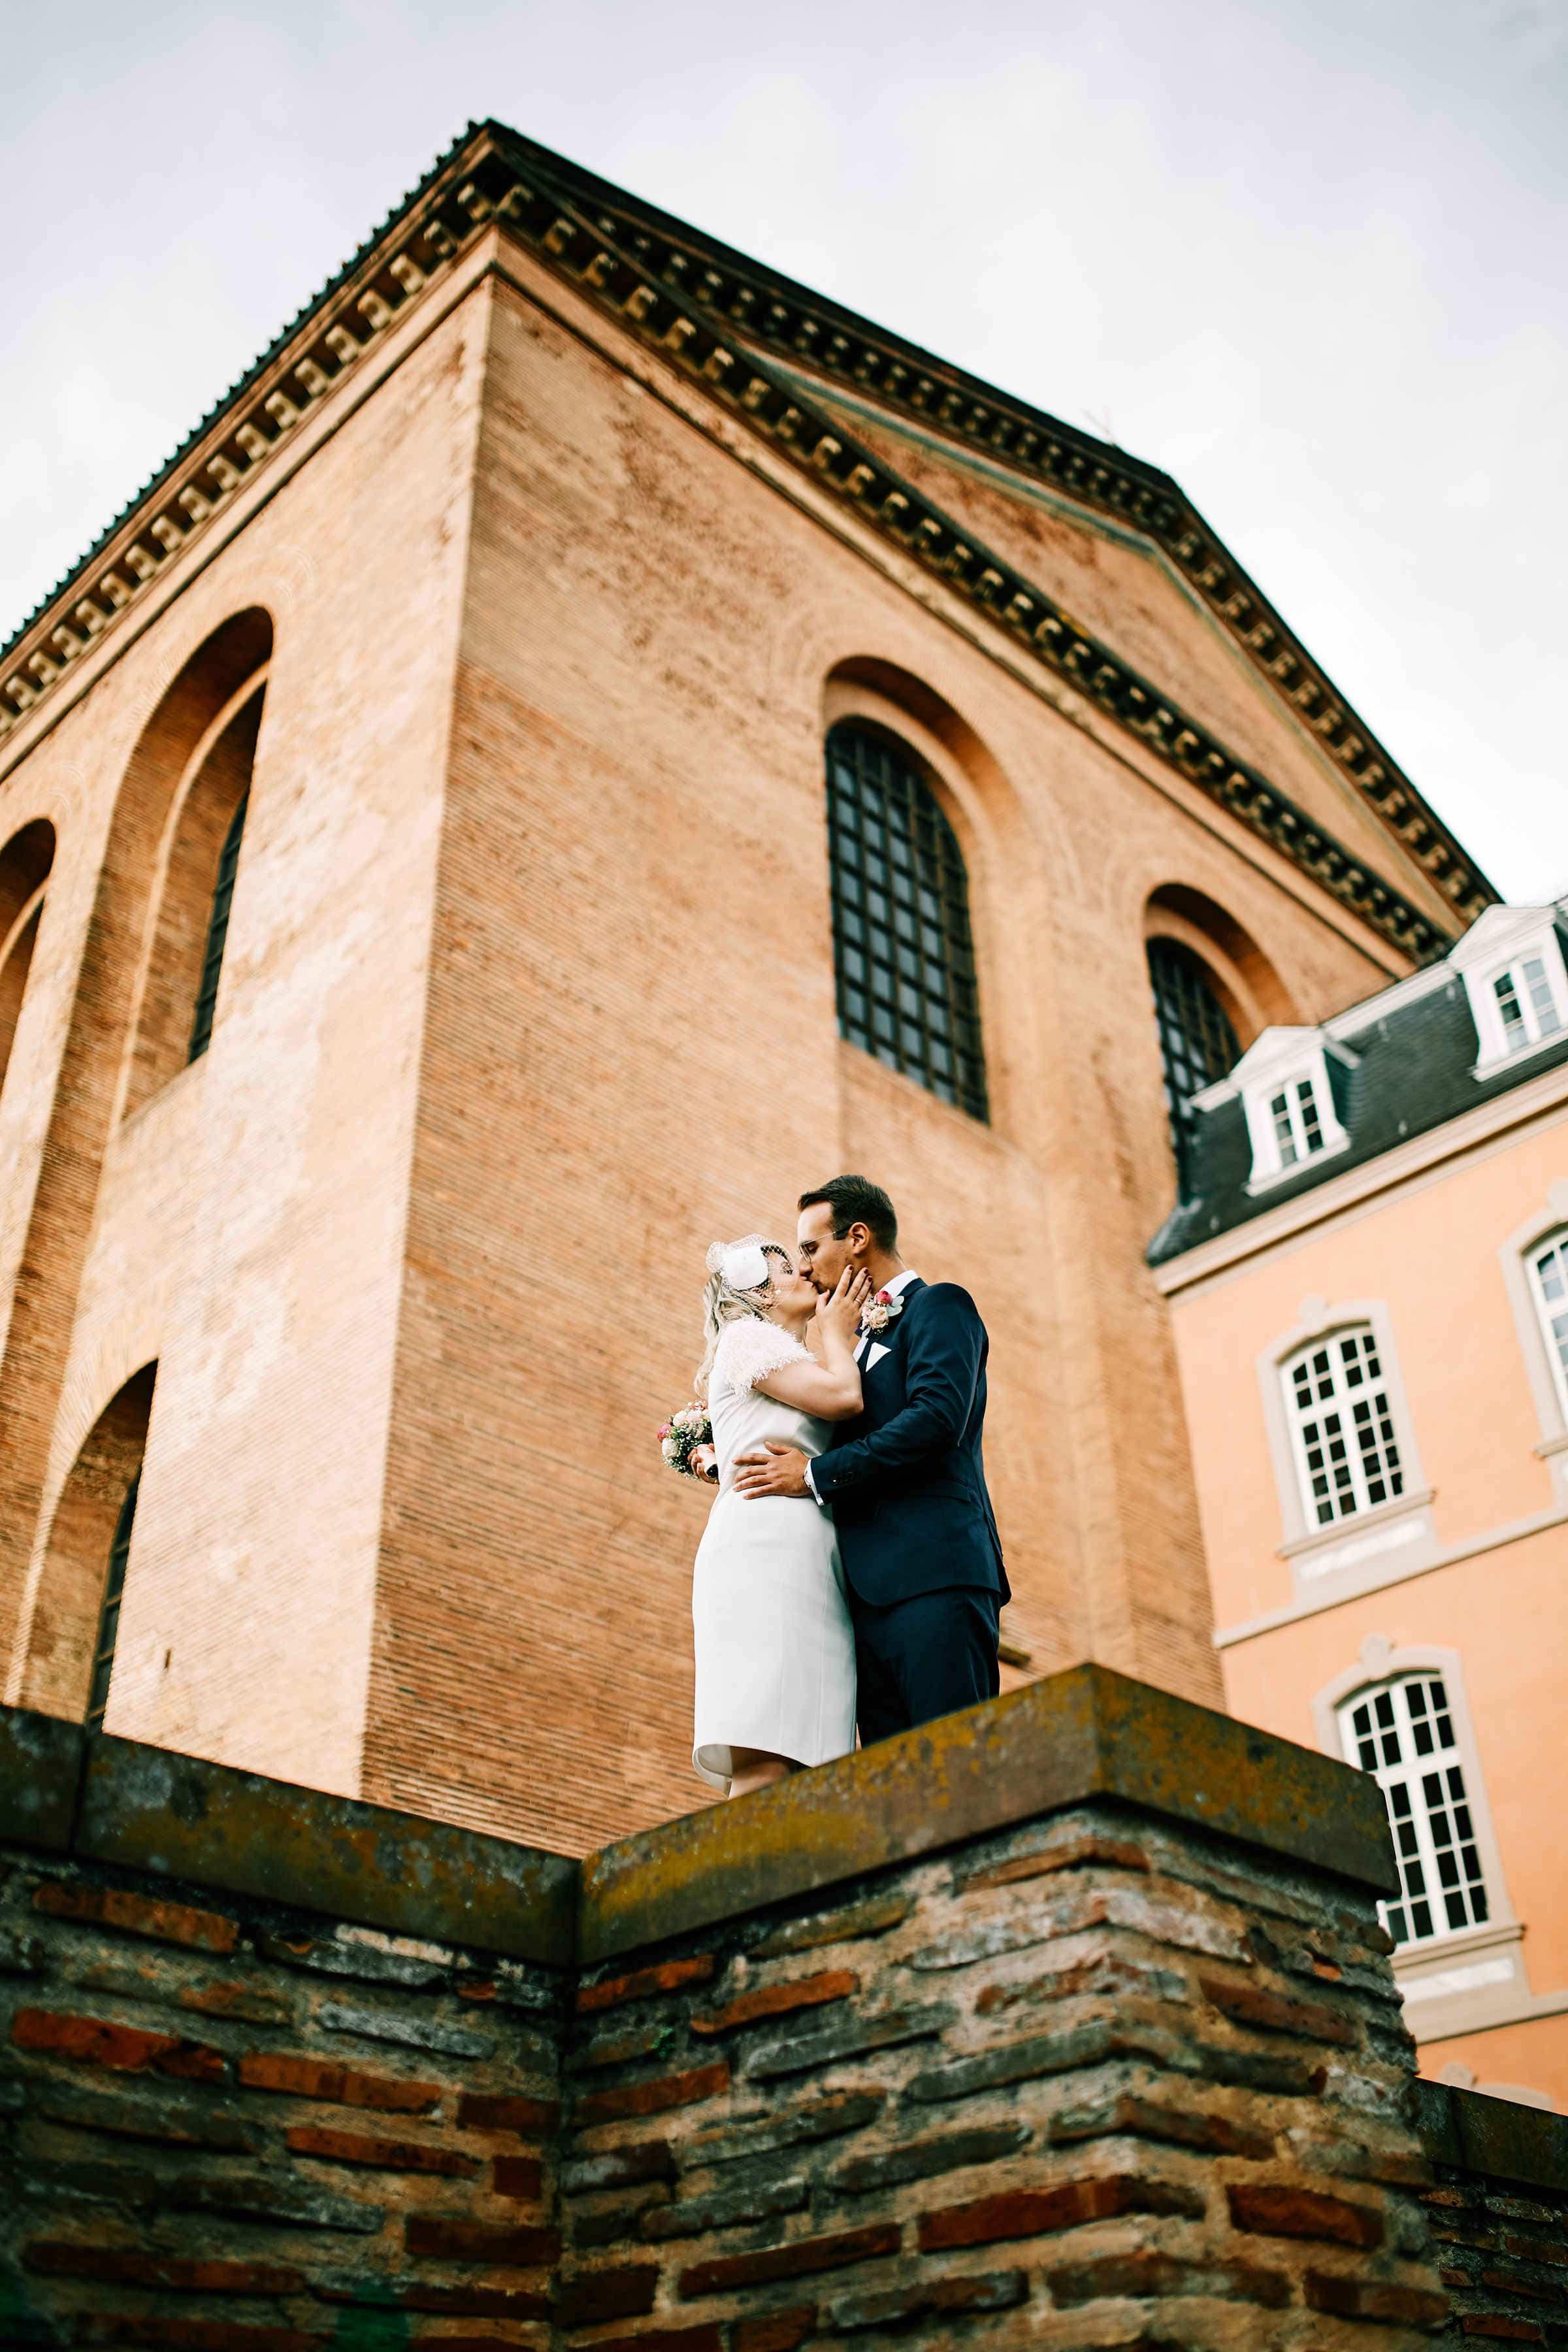 brautpaar fotoshooting basilika palastgarten 35mm